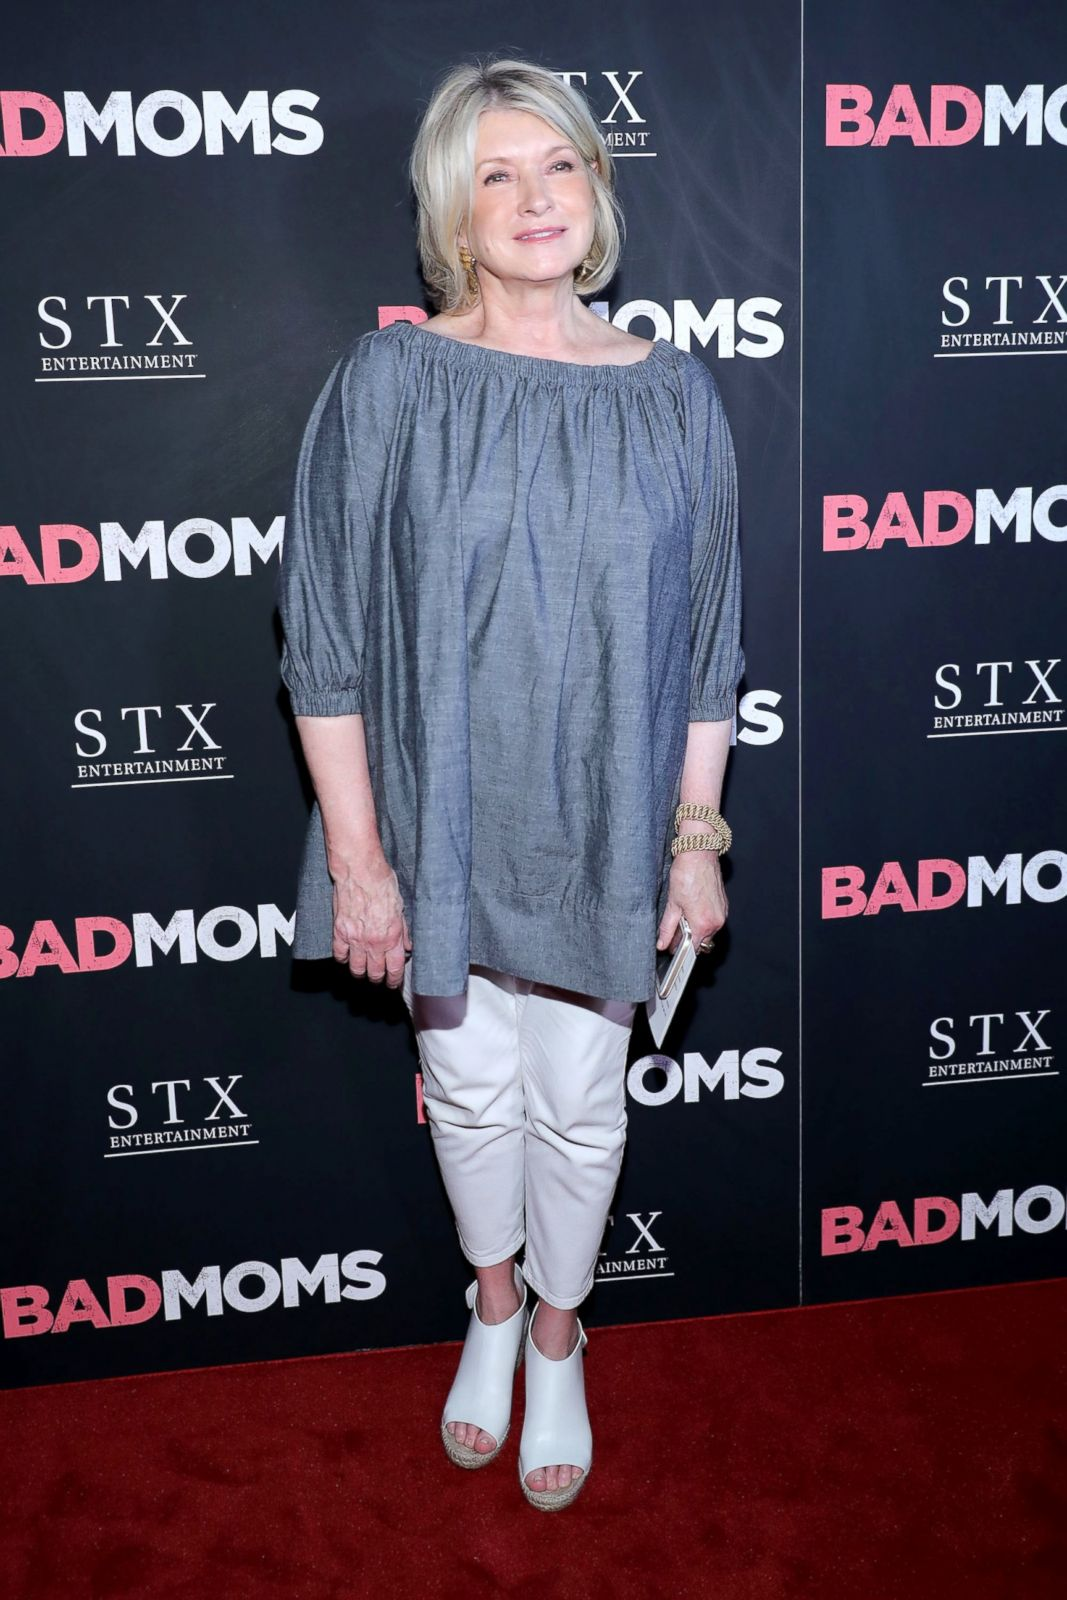 Martha Stewart Hits The Red Carpet In A Billowy Top